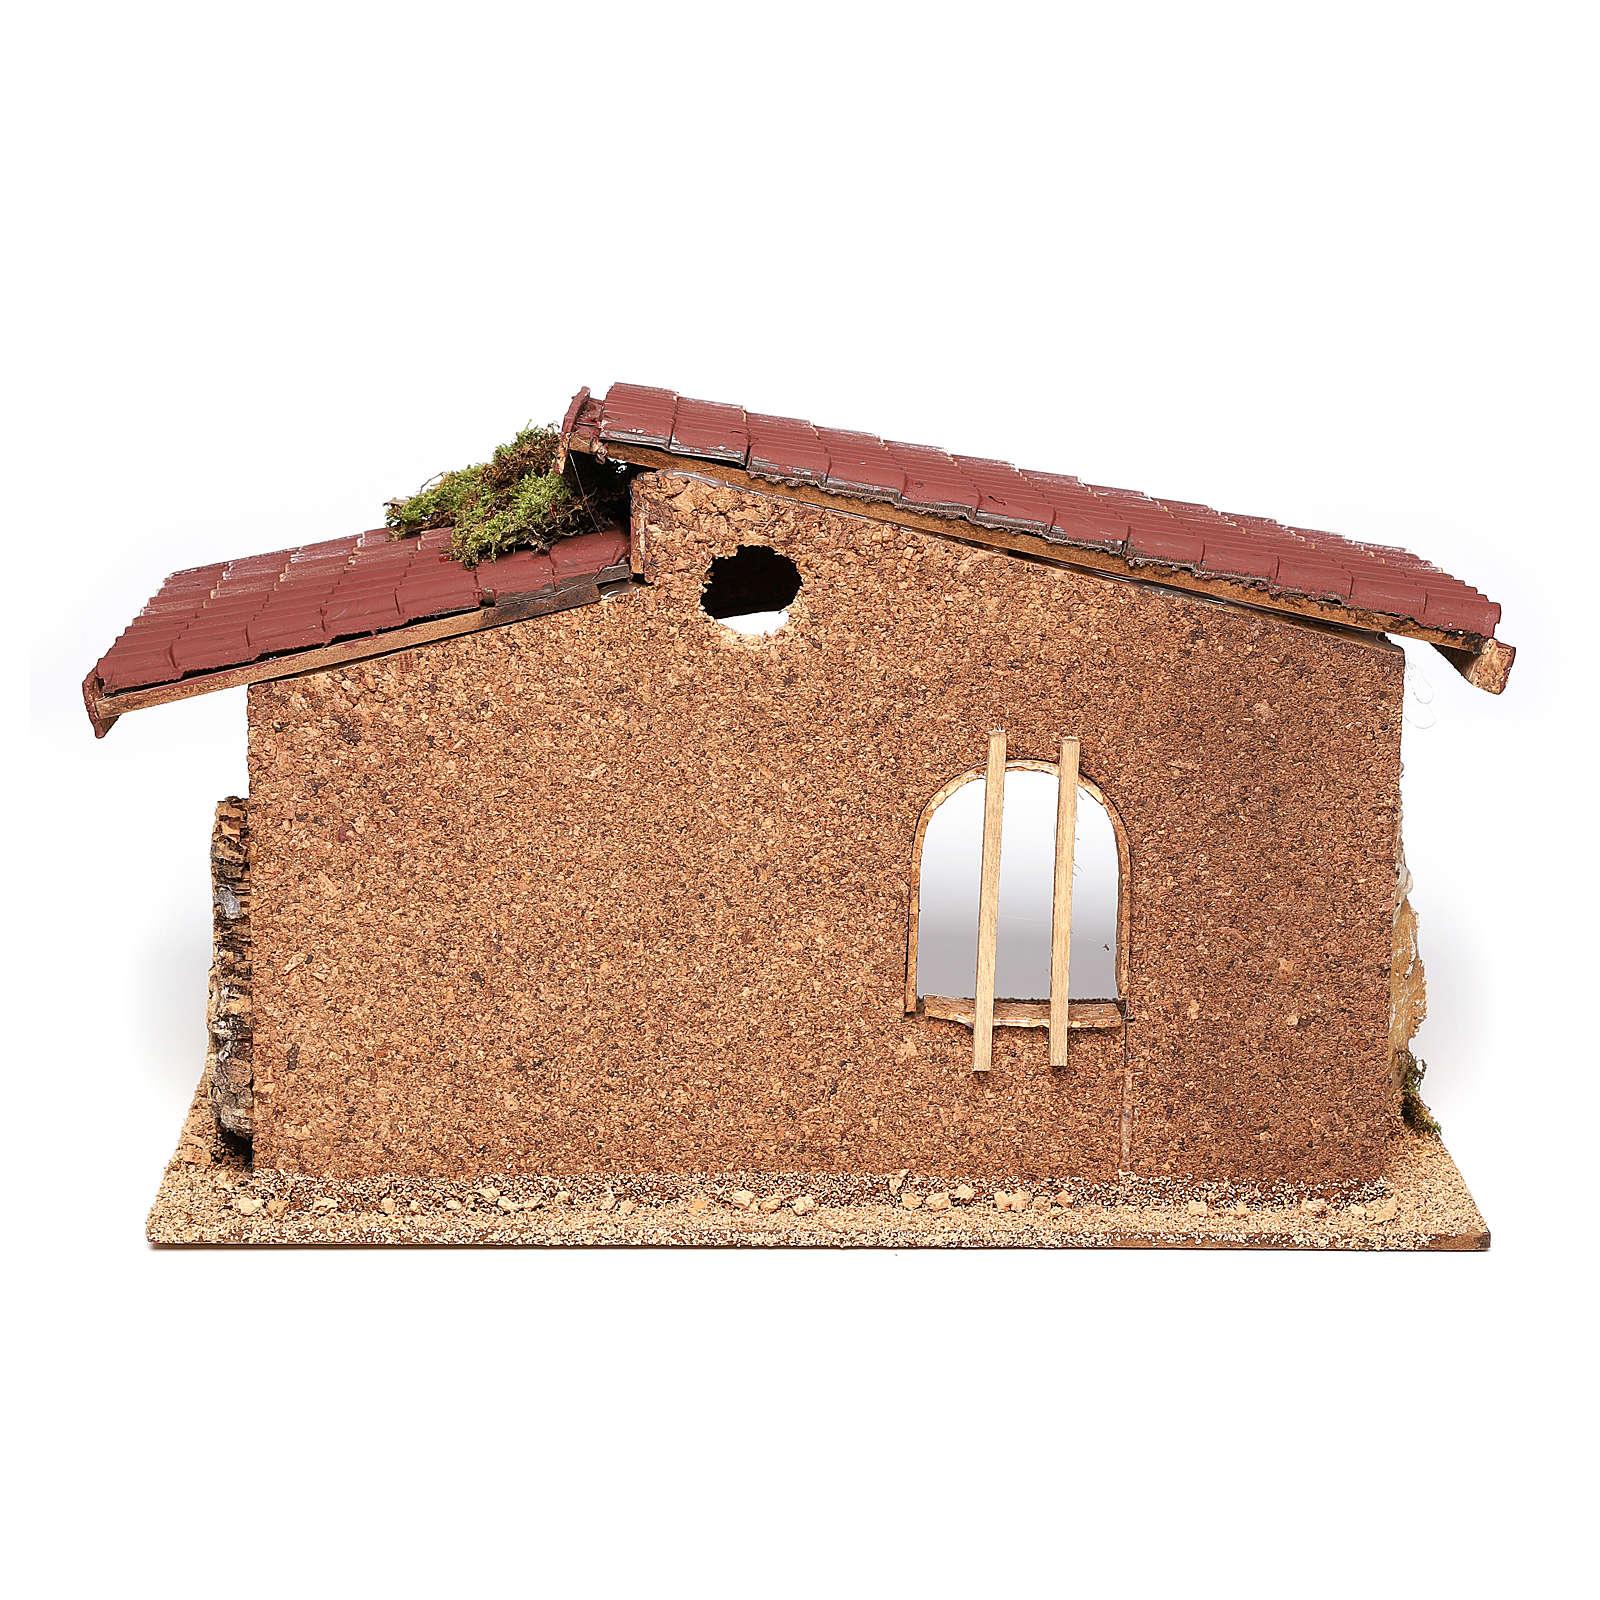 Cork and moss hut 21x35x20 cm 4